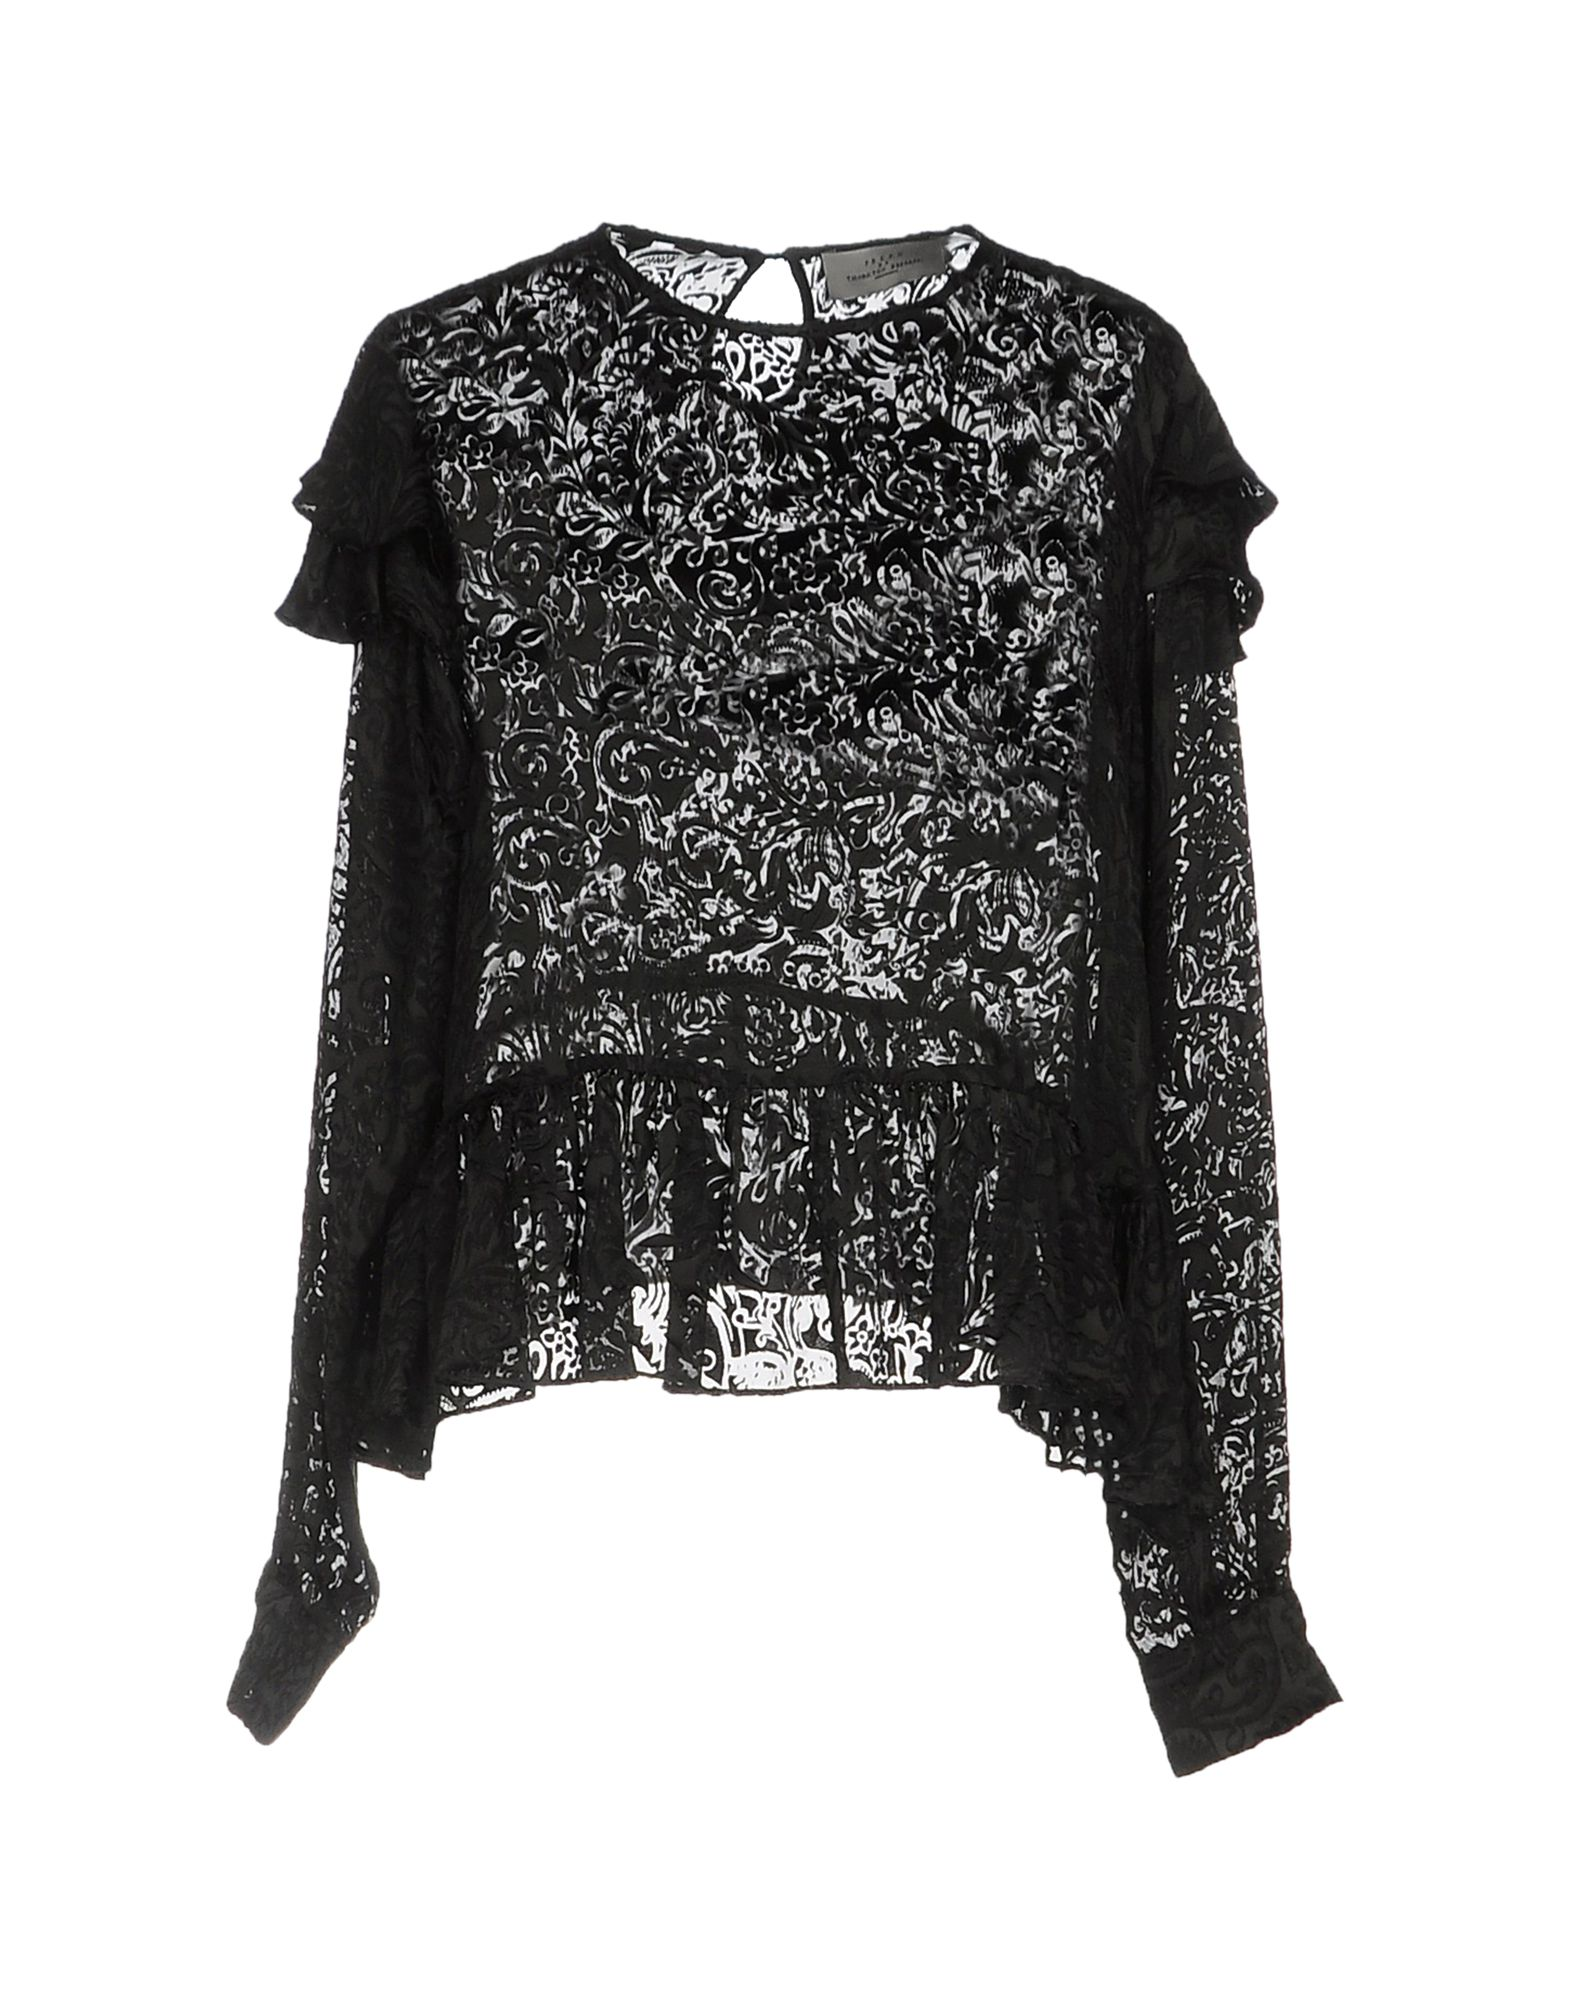 PREEN by THORNTON BREGAZZI Damen Bluse Farbe Schwarz Größe 5